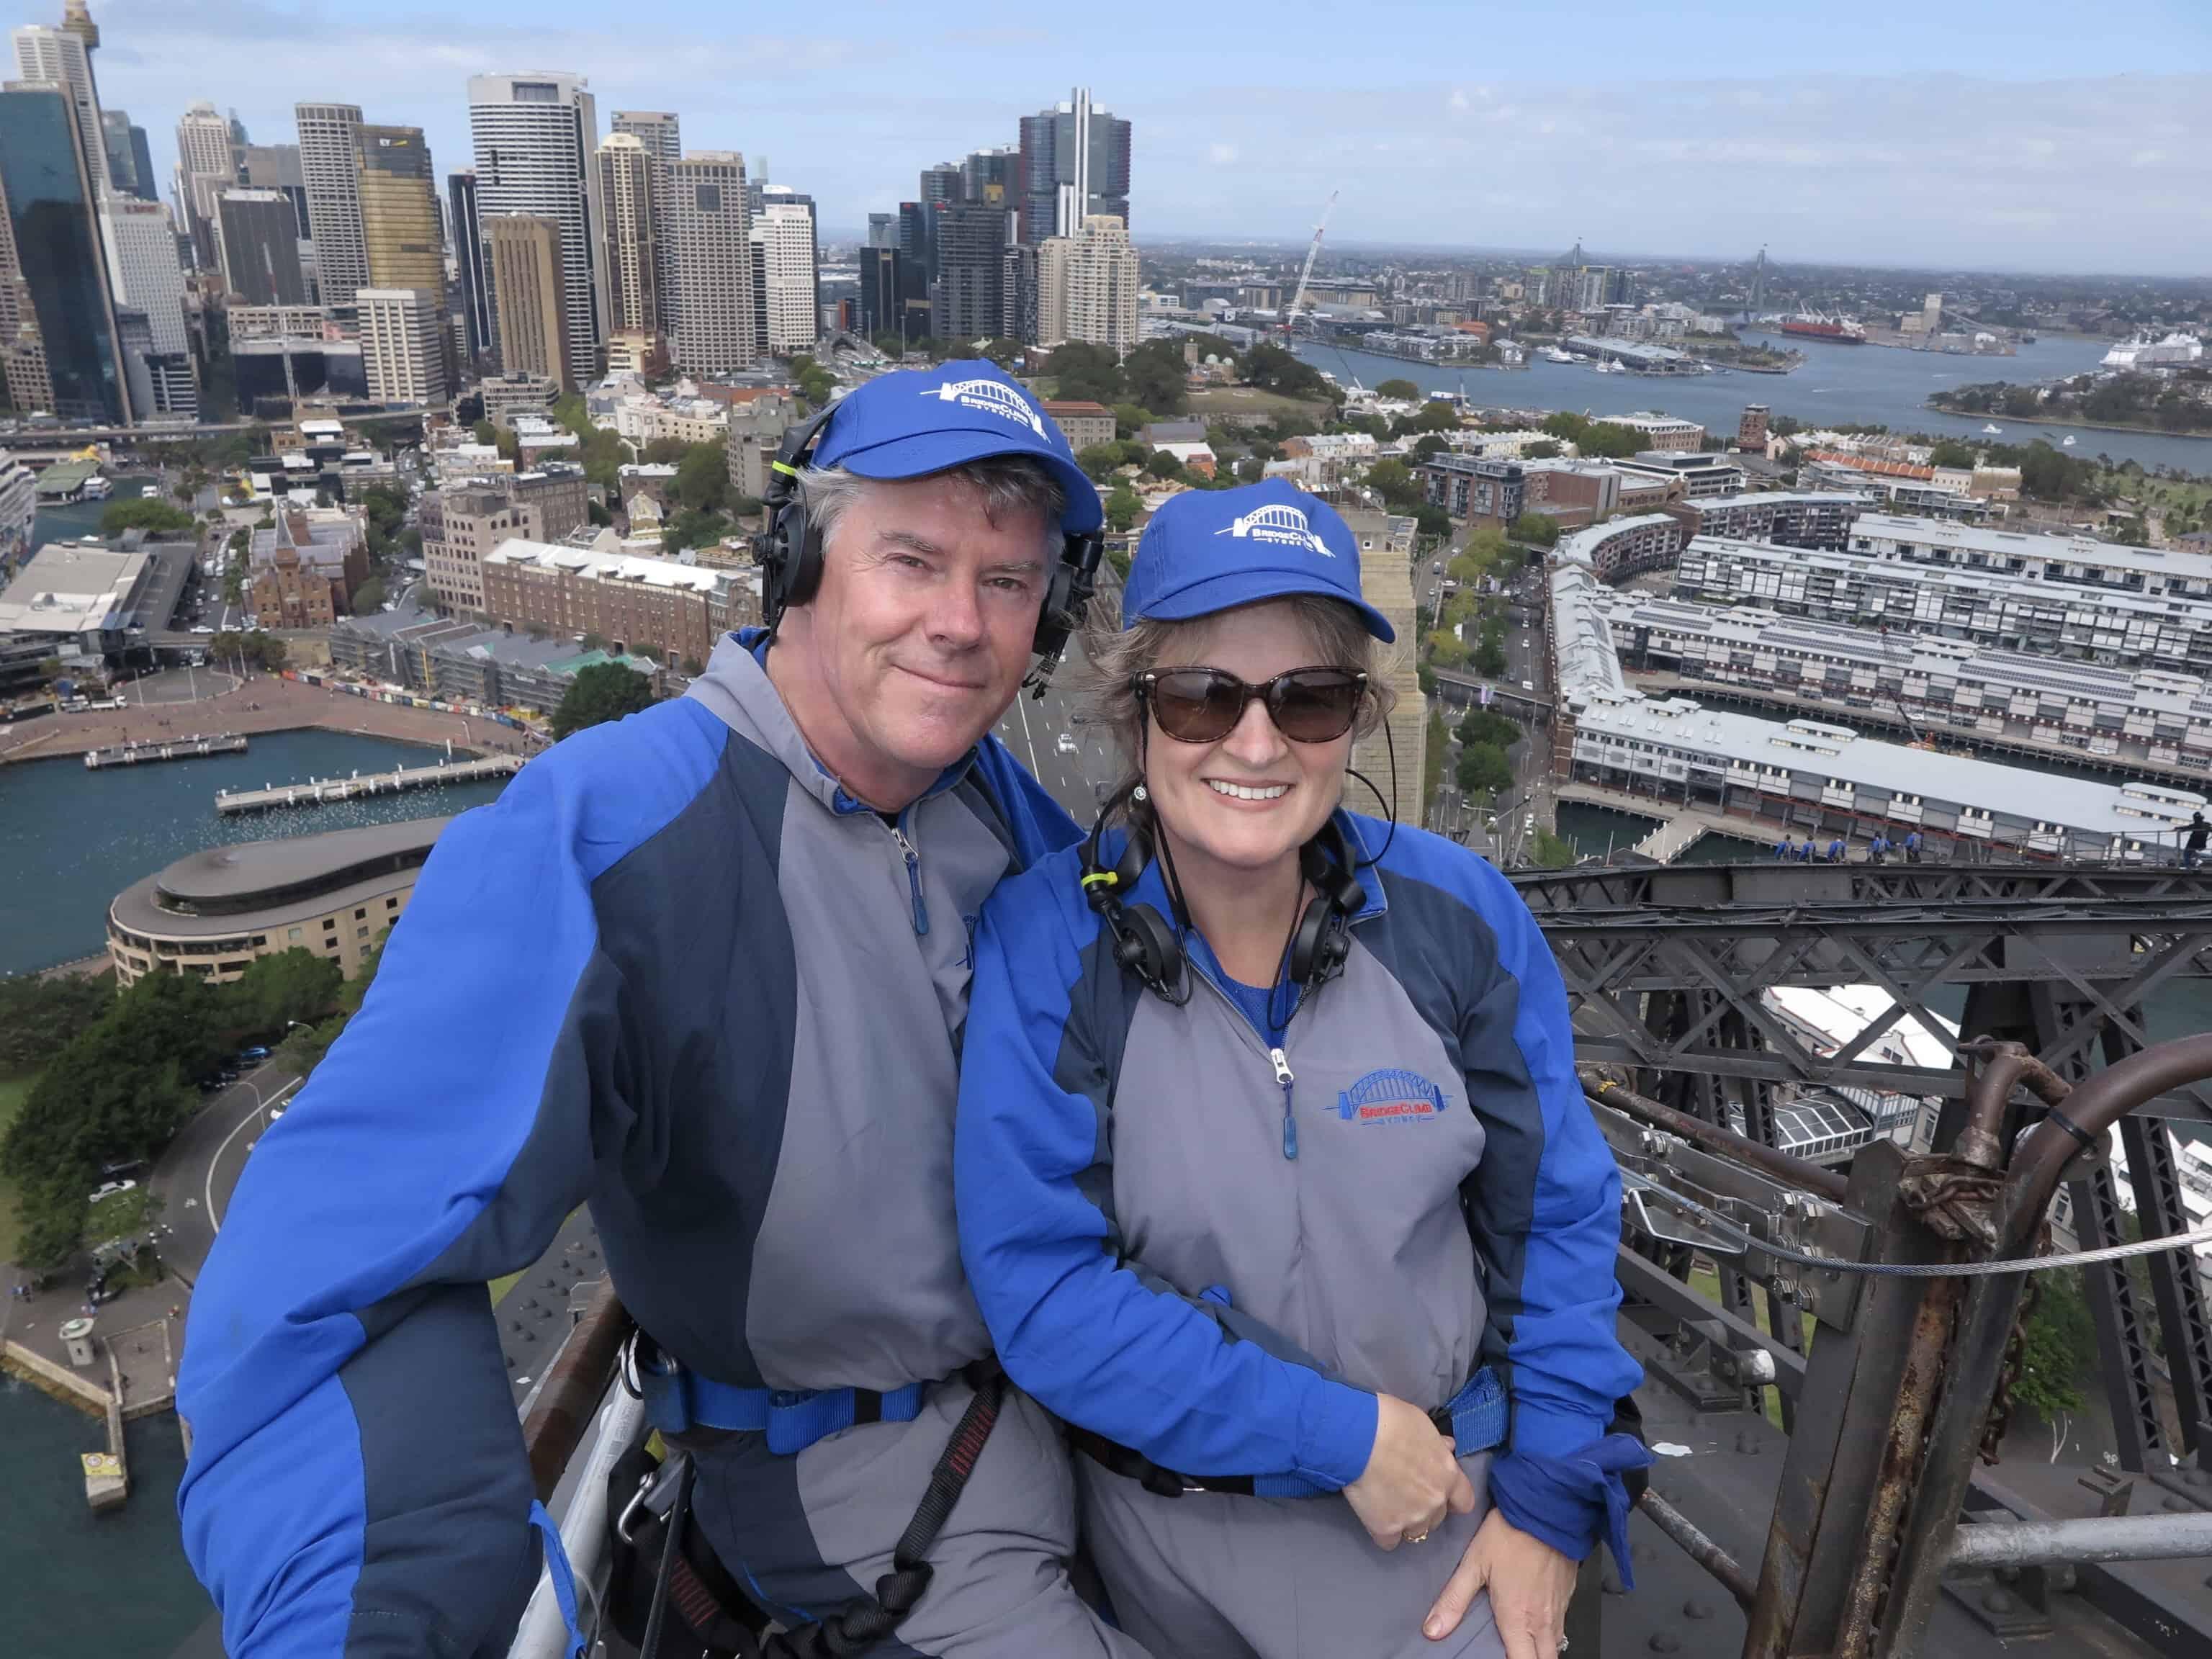 2019 year style- Bridge harbor climb what to wear